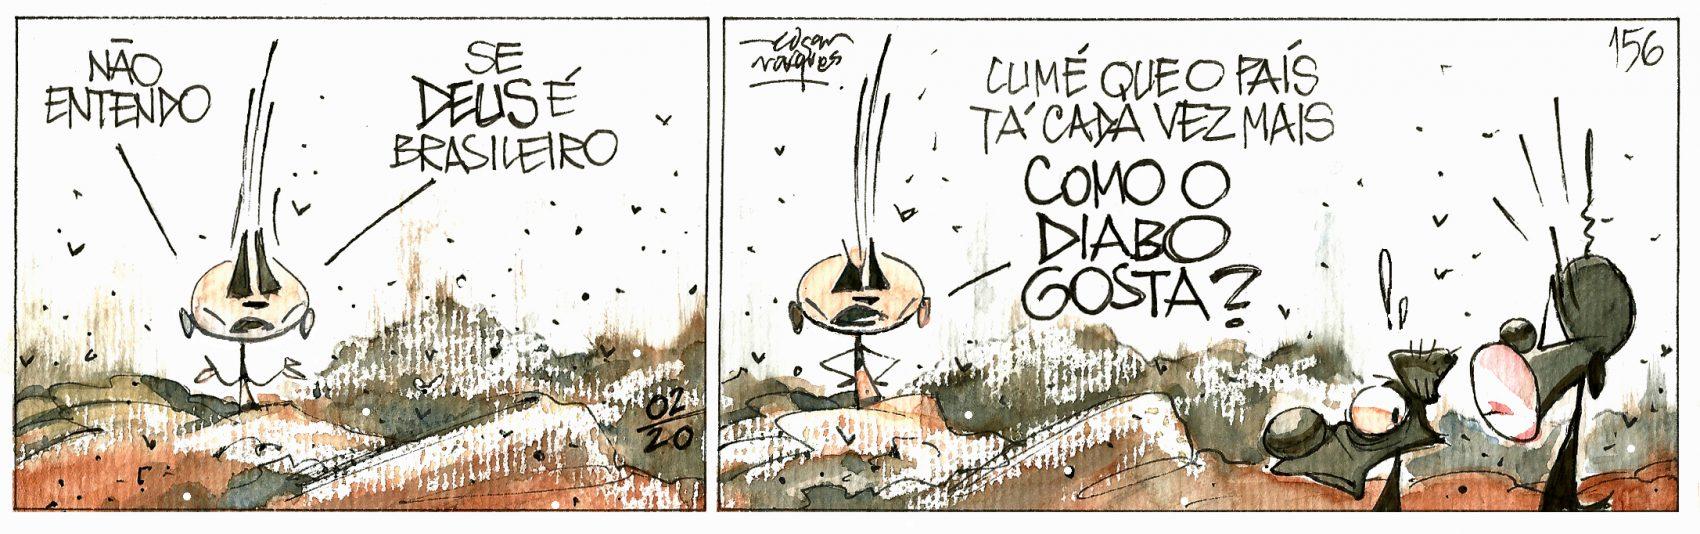 Quadrinhos | Rango | Edgar Vasques | Março de 2020 | Edgar Vasques